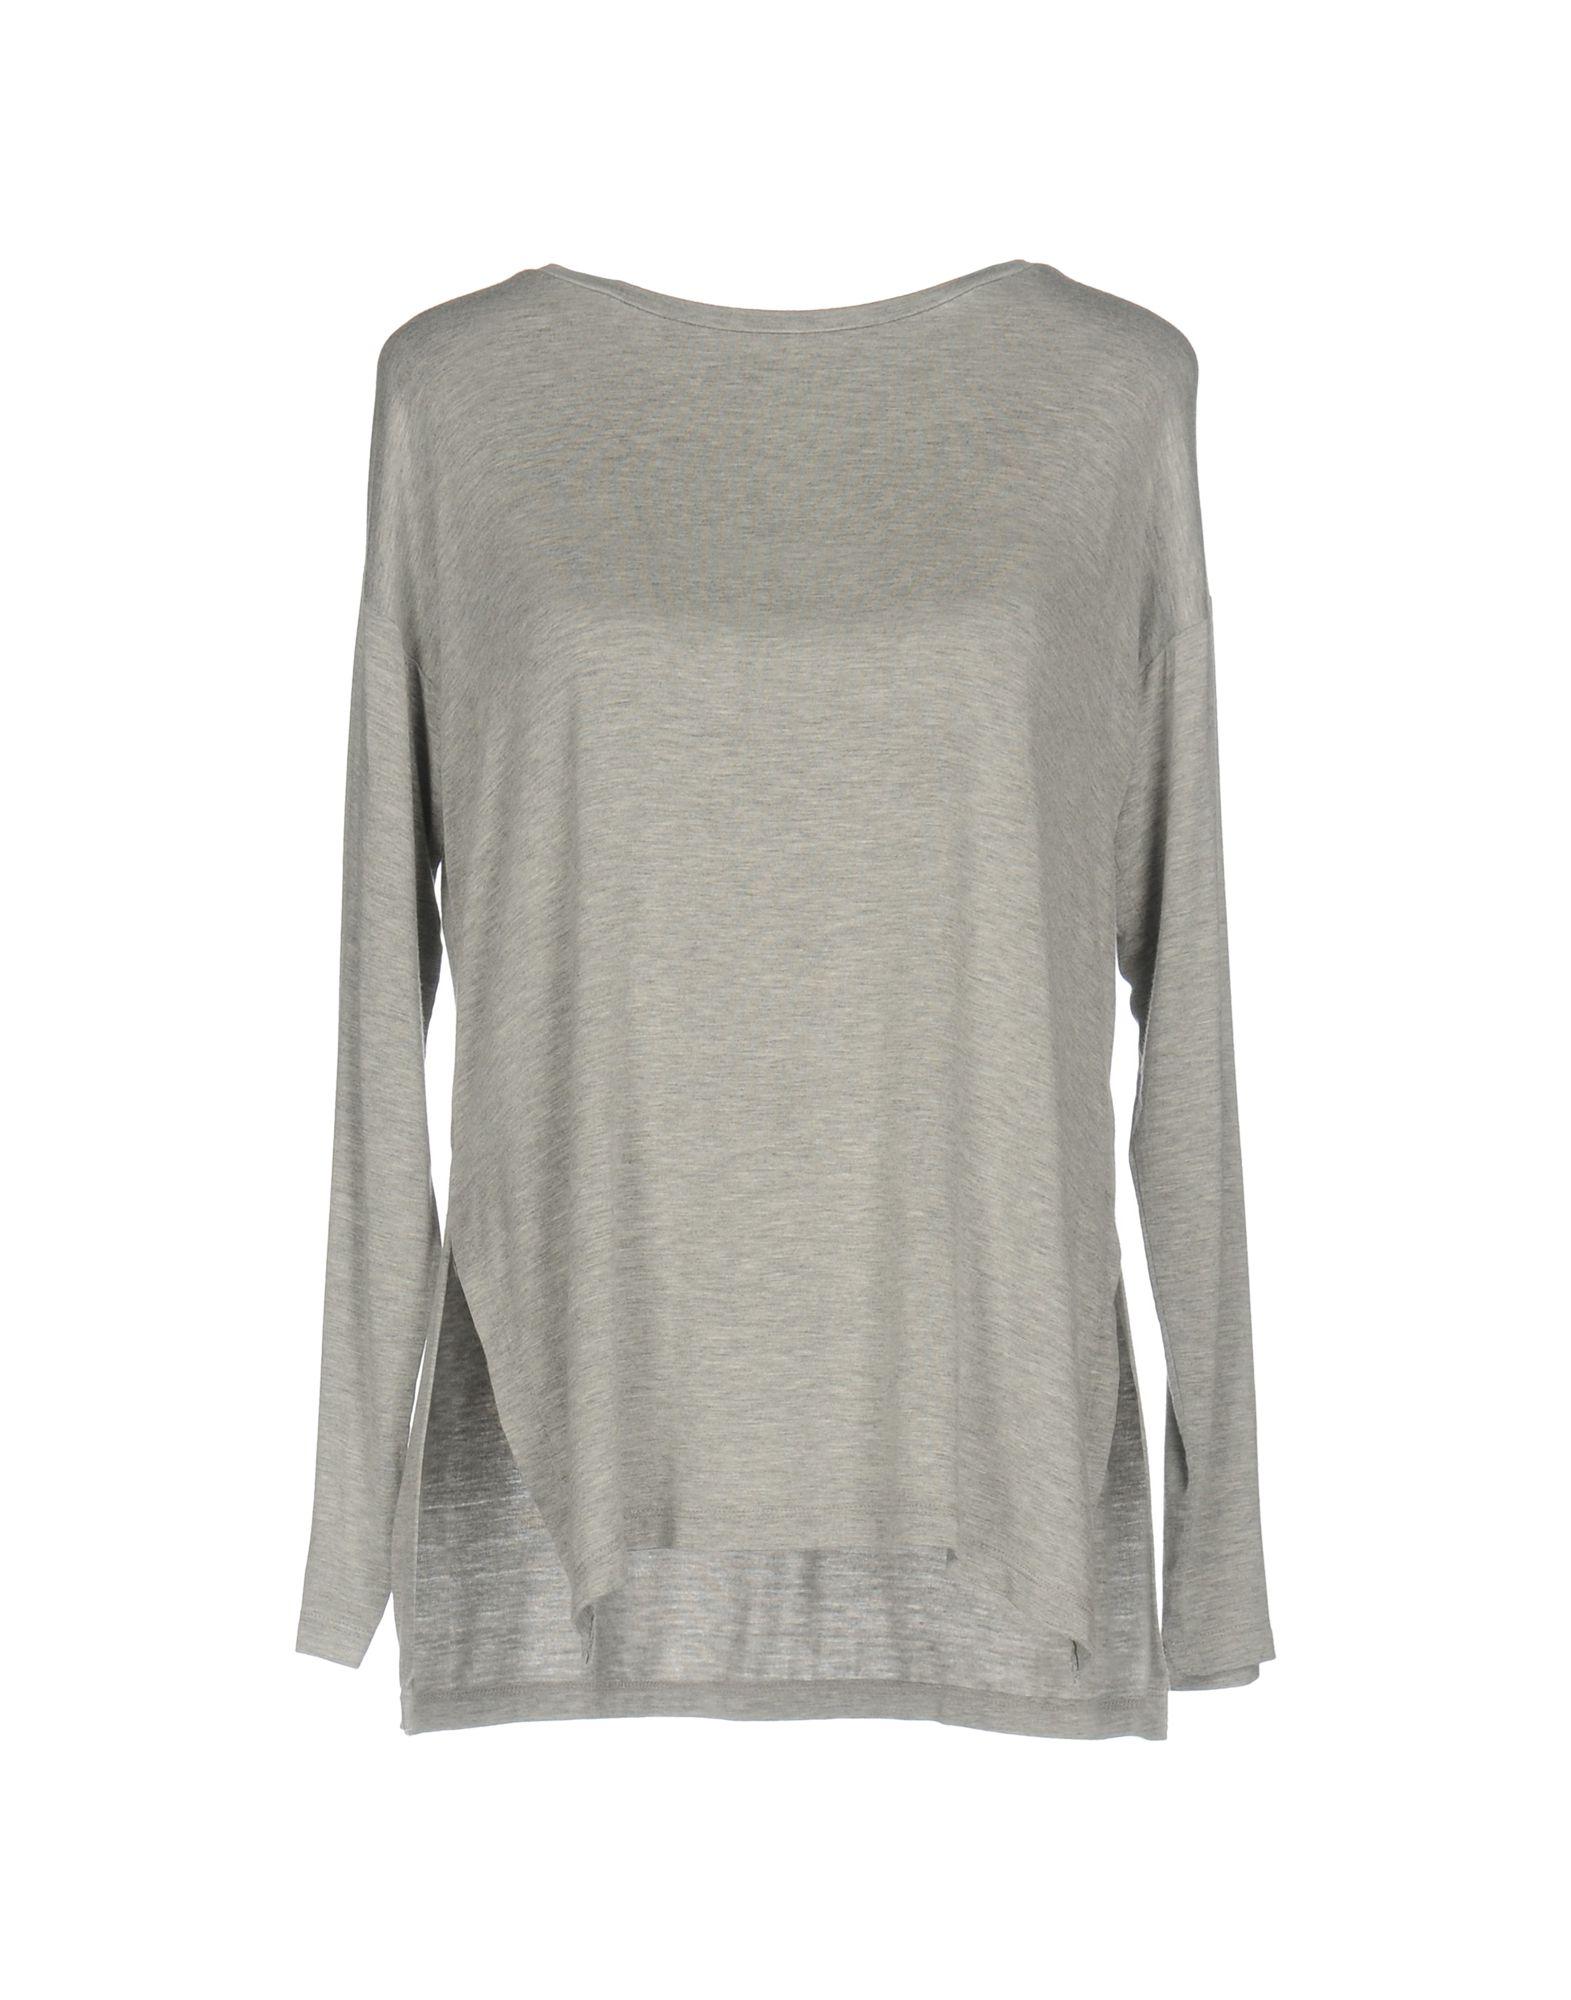 VELVET by GRAHAM & SPENCER Damen T-shirts Farbe Grau Größe 4